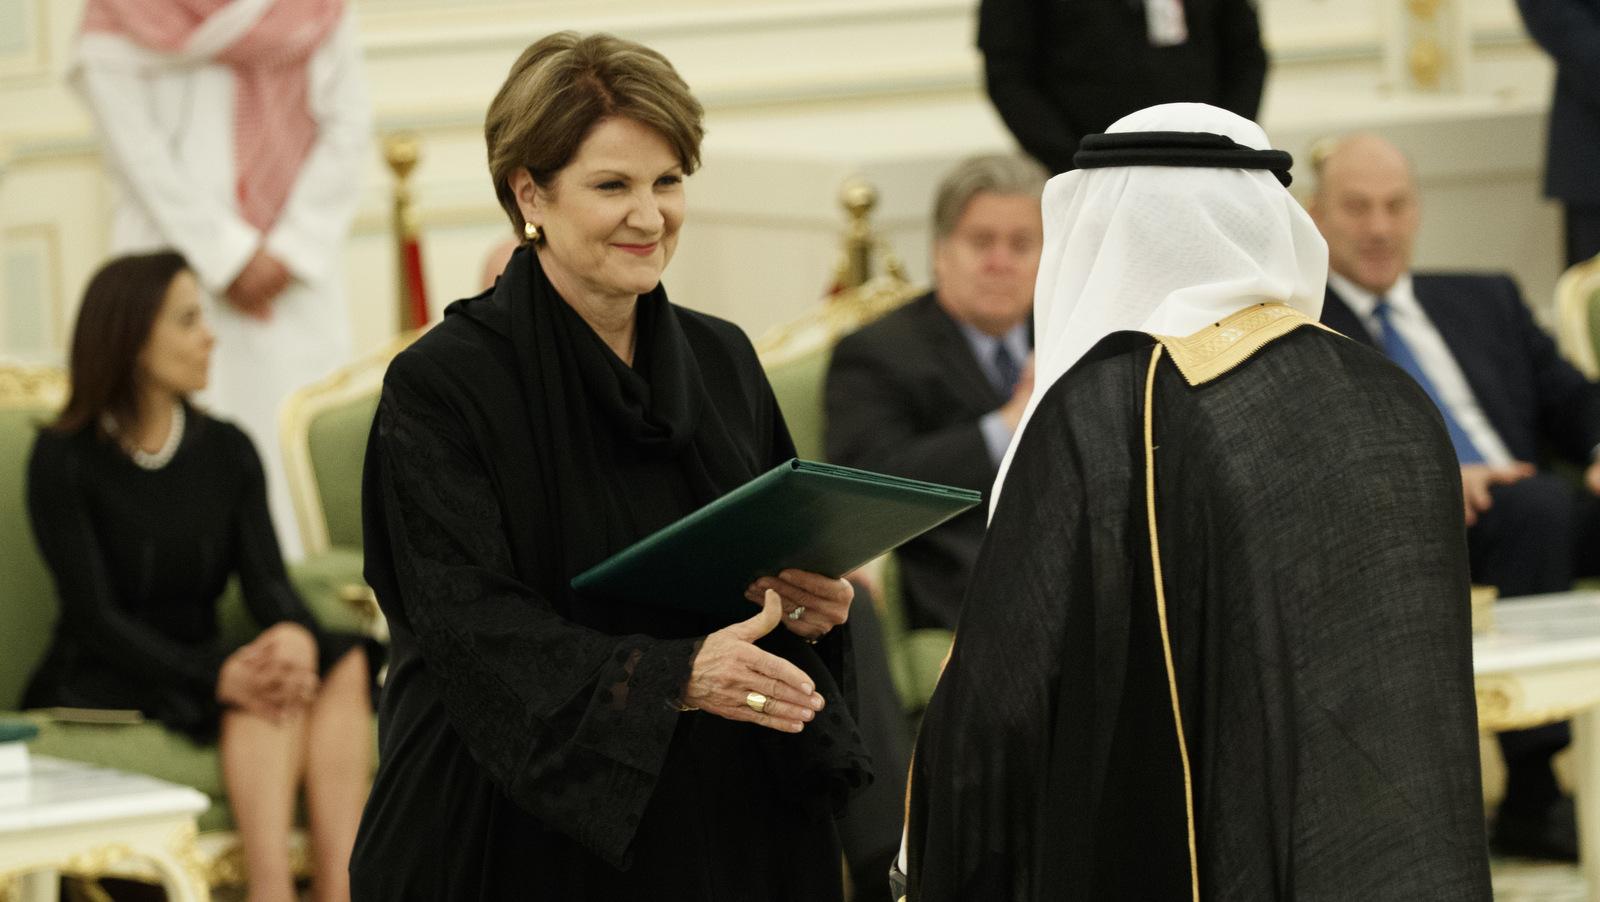 Lockheed Martin CEO Marillyn Hewson participates in a signing ceremony between President Donald Trump and Saudi King Salam at the Royal Court Palace, Saturday, May 20, 2017, in Riyadh. (AP/Evan Vucci)